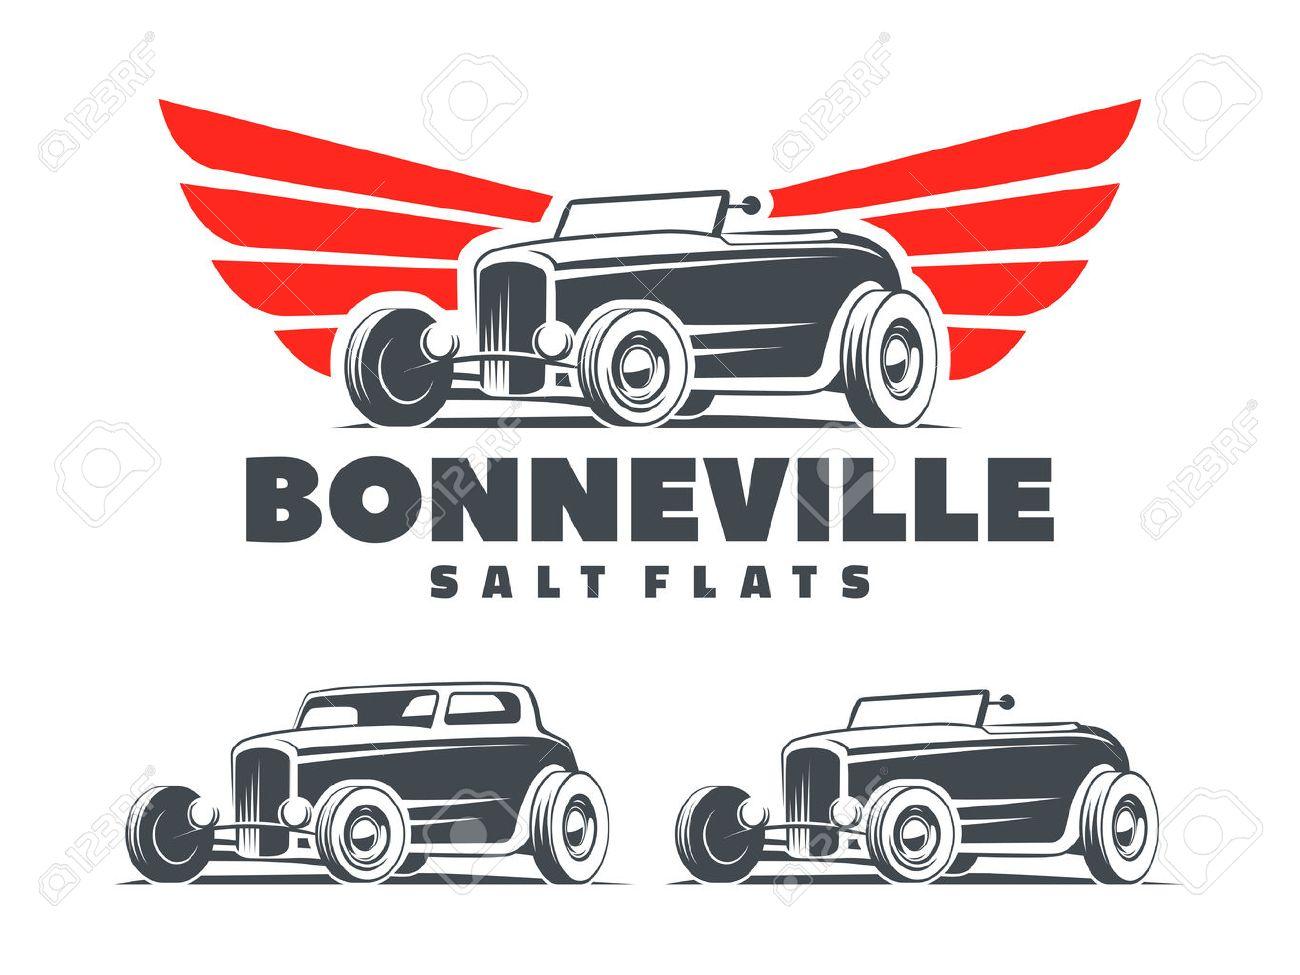 retro hot rod with stylized wings logo bonneville salt flats rh 123rf com hot rod clipart free download hot rod clipart free download